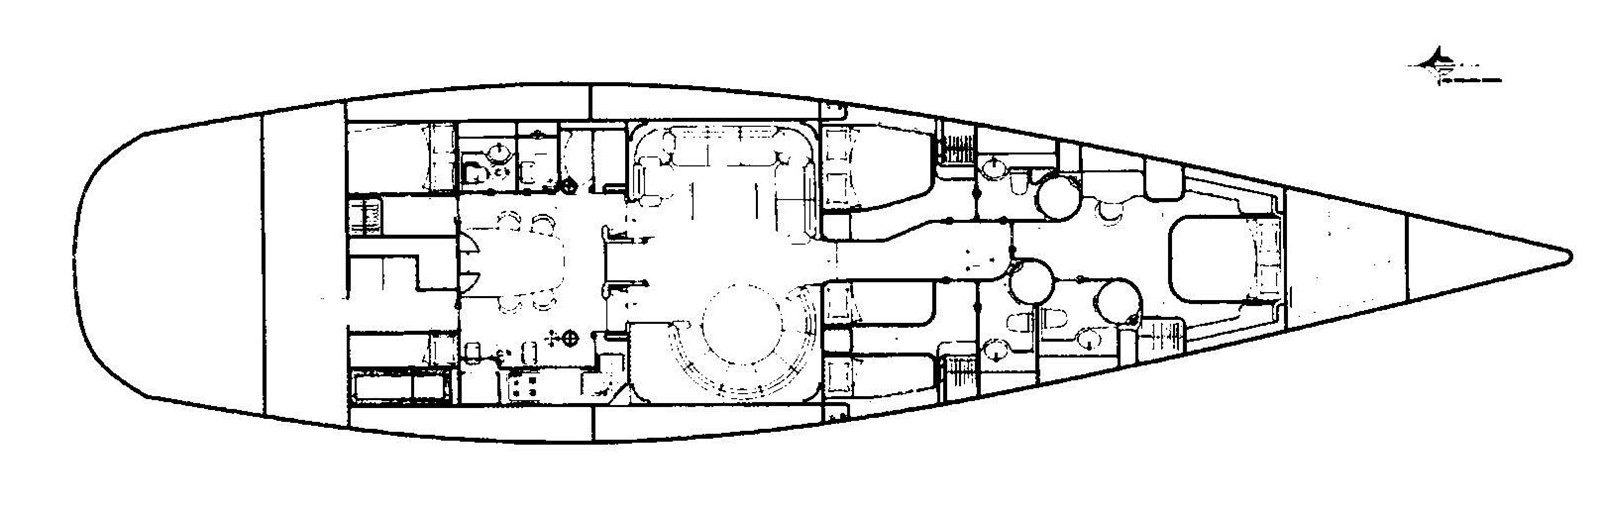 Plan 2000 GREEN MARINE, U.K. Super Maxi Fast Cruiser Cruising Sailboat 961739